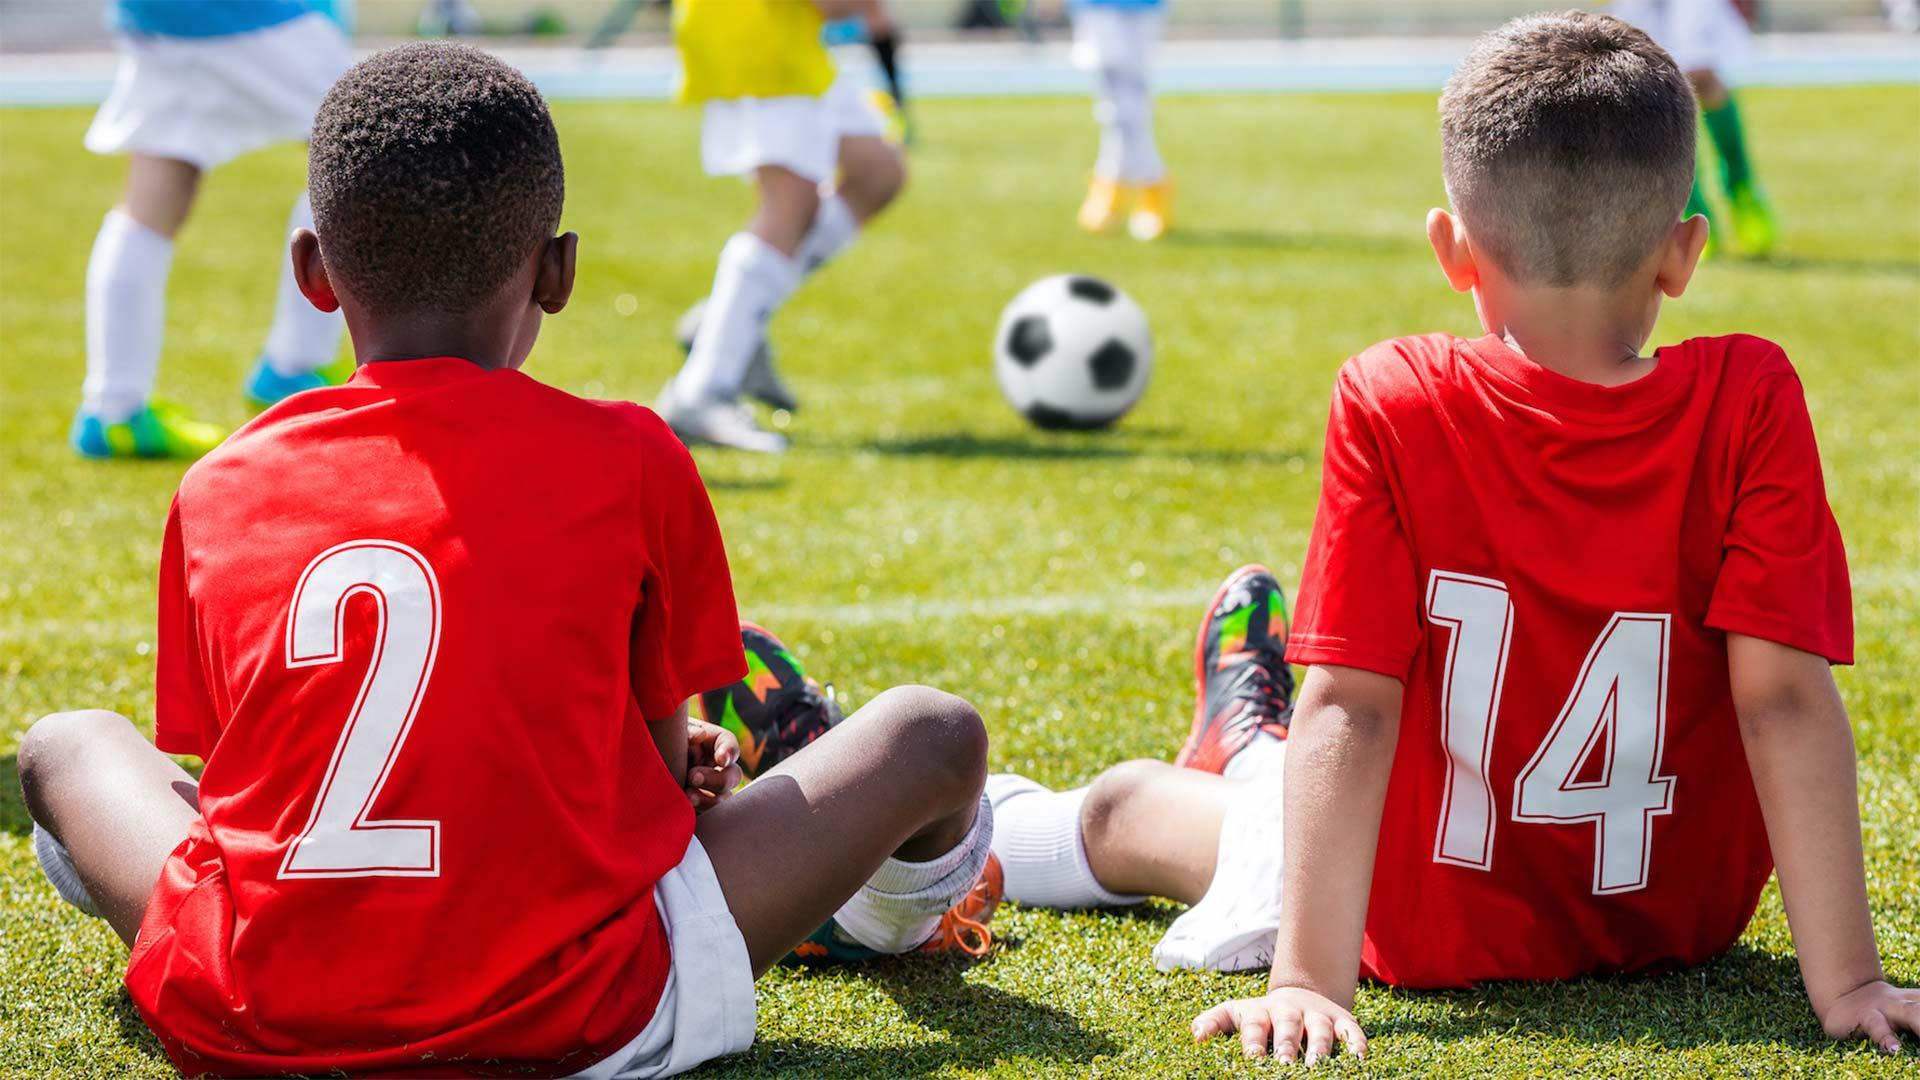 Het debat: Racisme in het voetbal